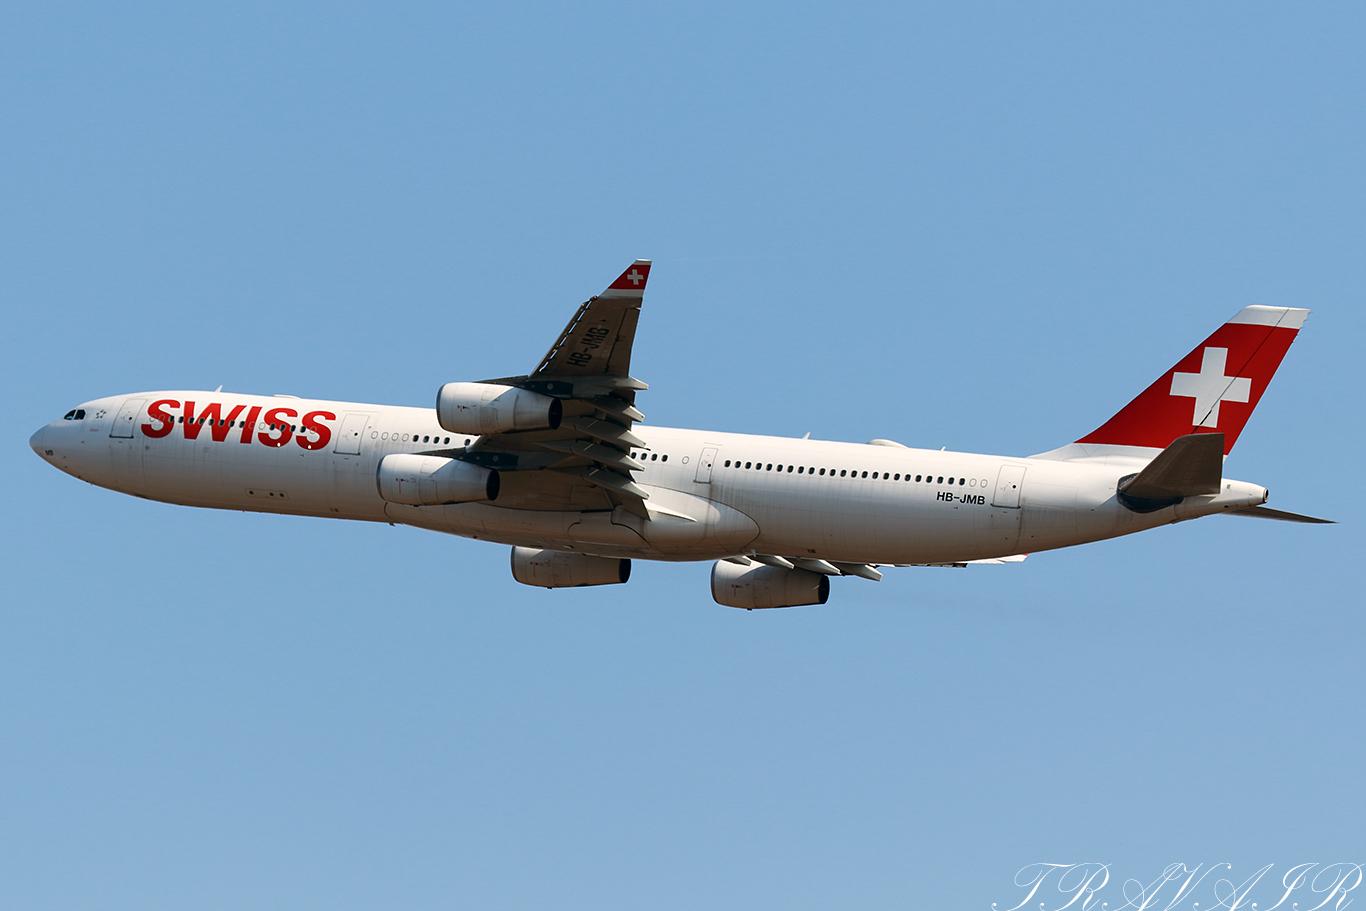 LX/SWR/スイス国際航空 LX161 A340-300 HB-JMB